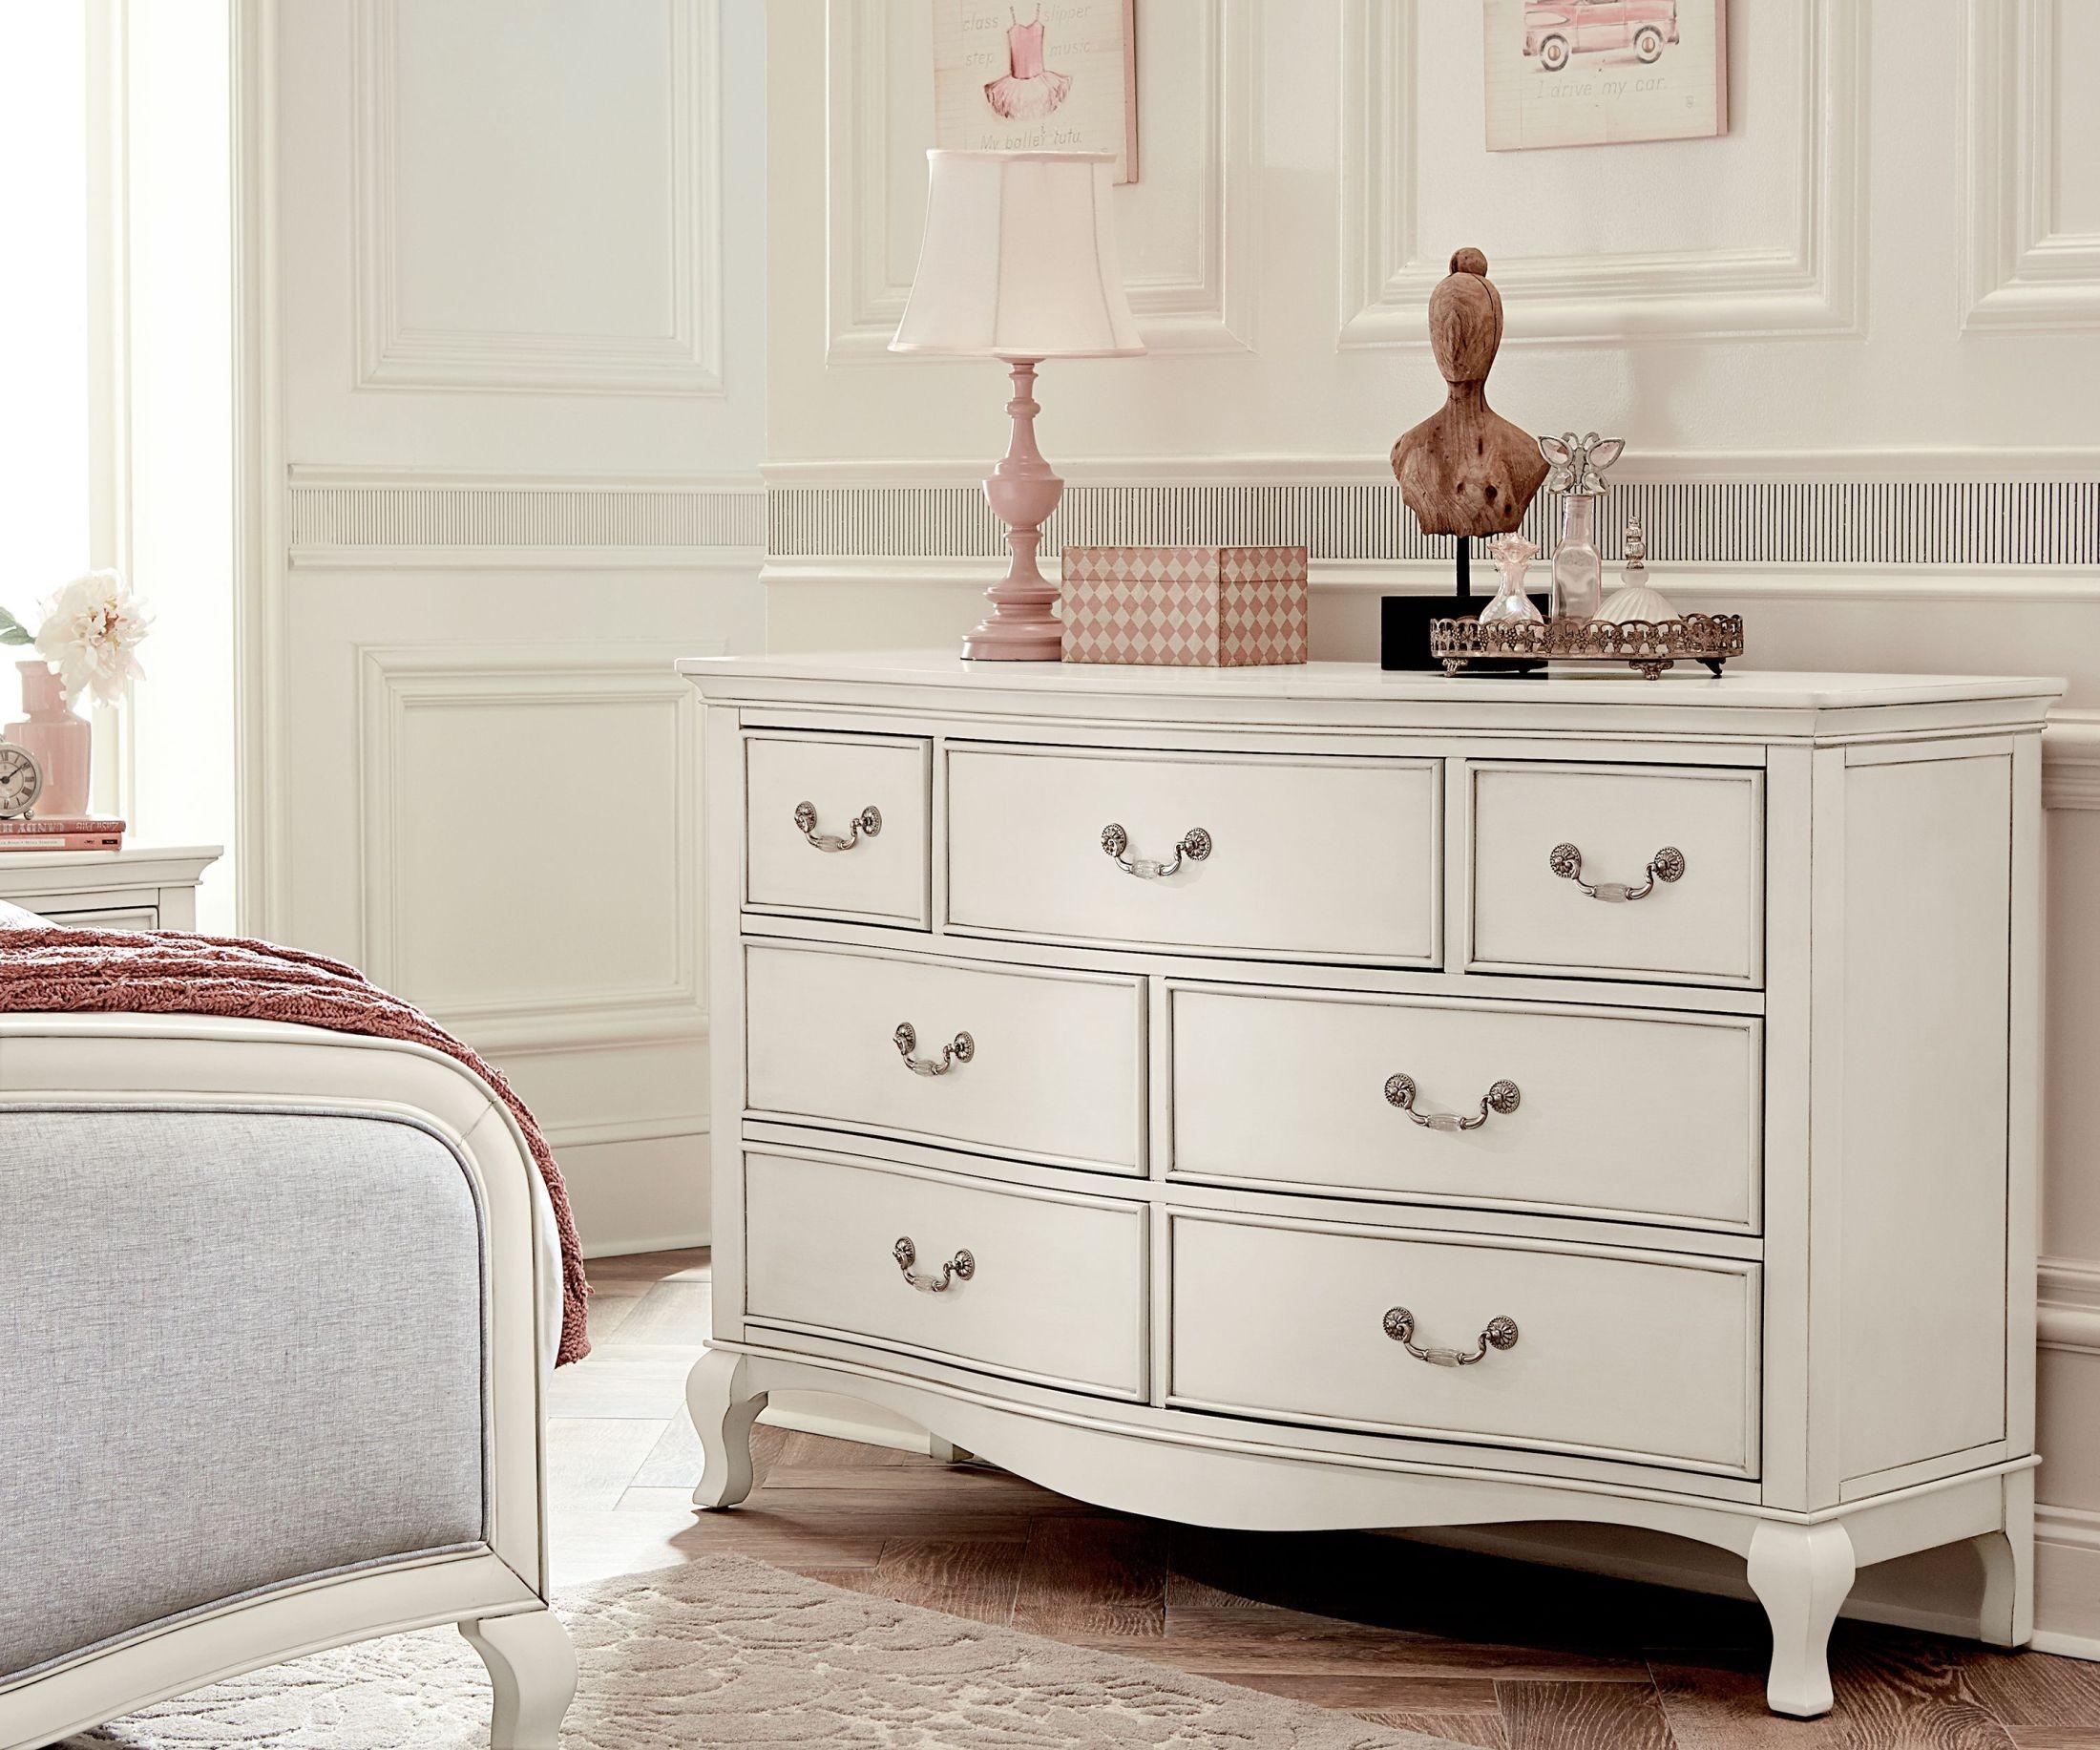 Kensington Antique White 7 Drawer Double Dresser From Ne Kids Coleman Furniture